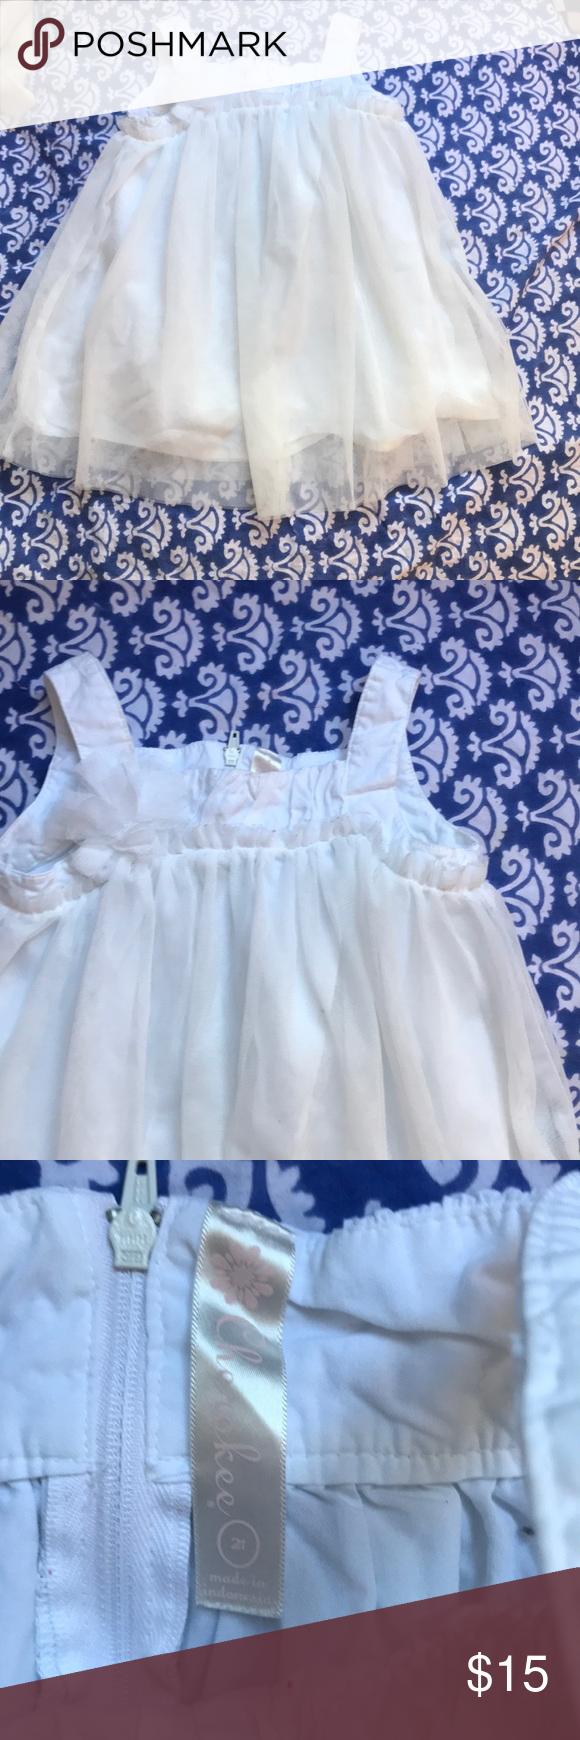 Very Pretty White Dress Sz 2t Pretty White Dresses Dresses Casual Dresses [ 1740 x 580 Pixel ]